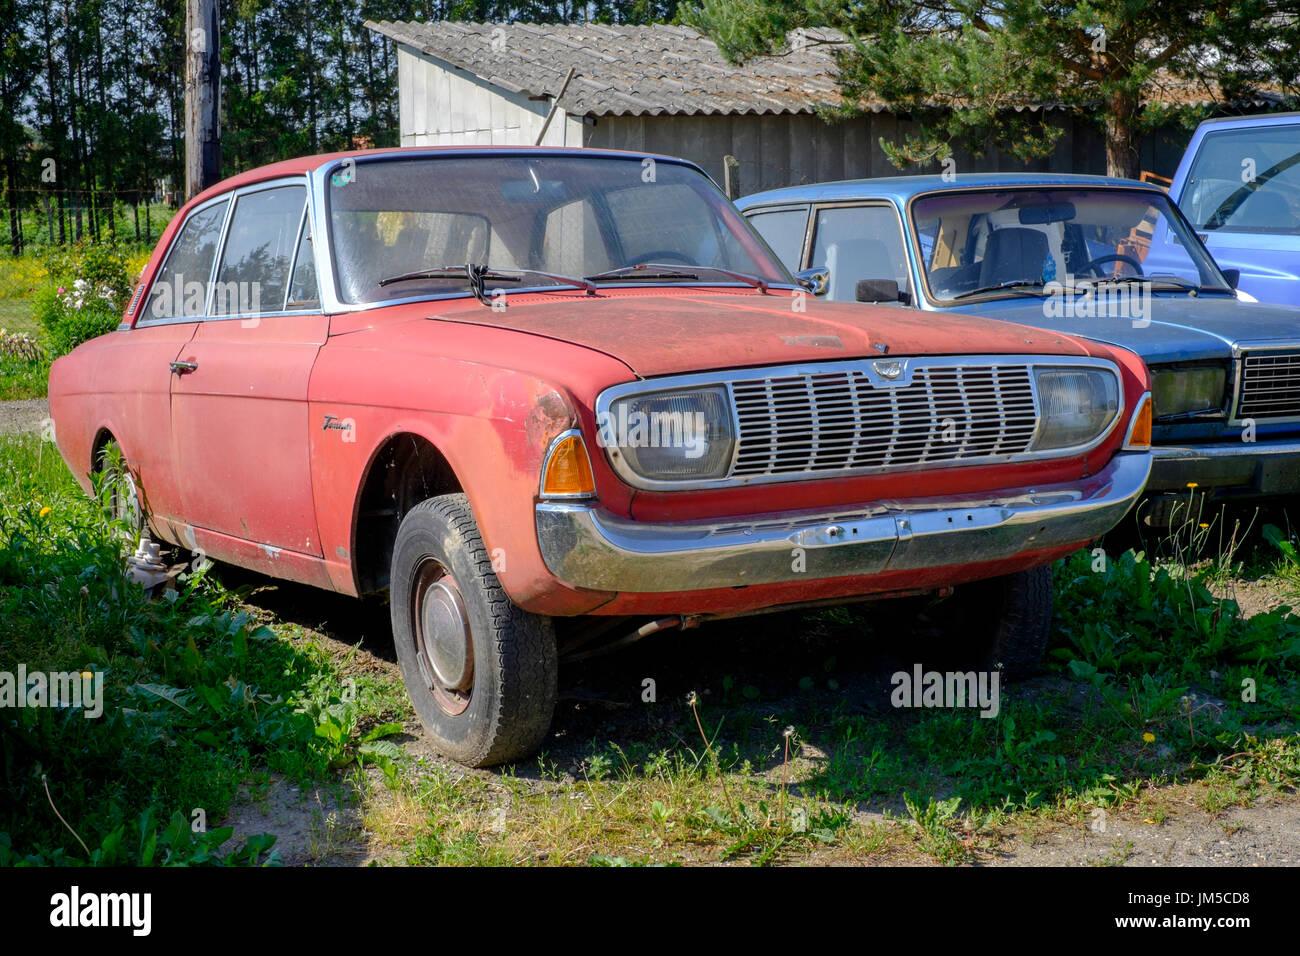 scrapped-car-at-the-edge-of-a-garage-forecourt-zala-county-hungary-JM5CD8.jpg